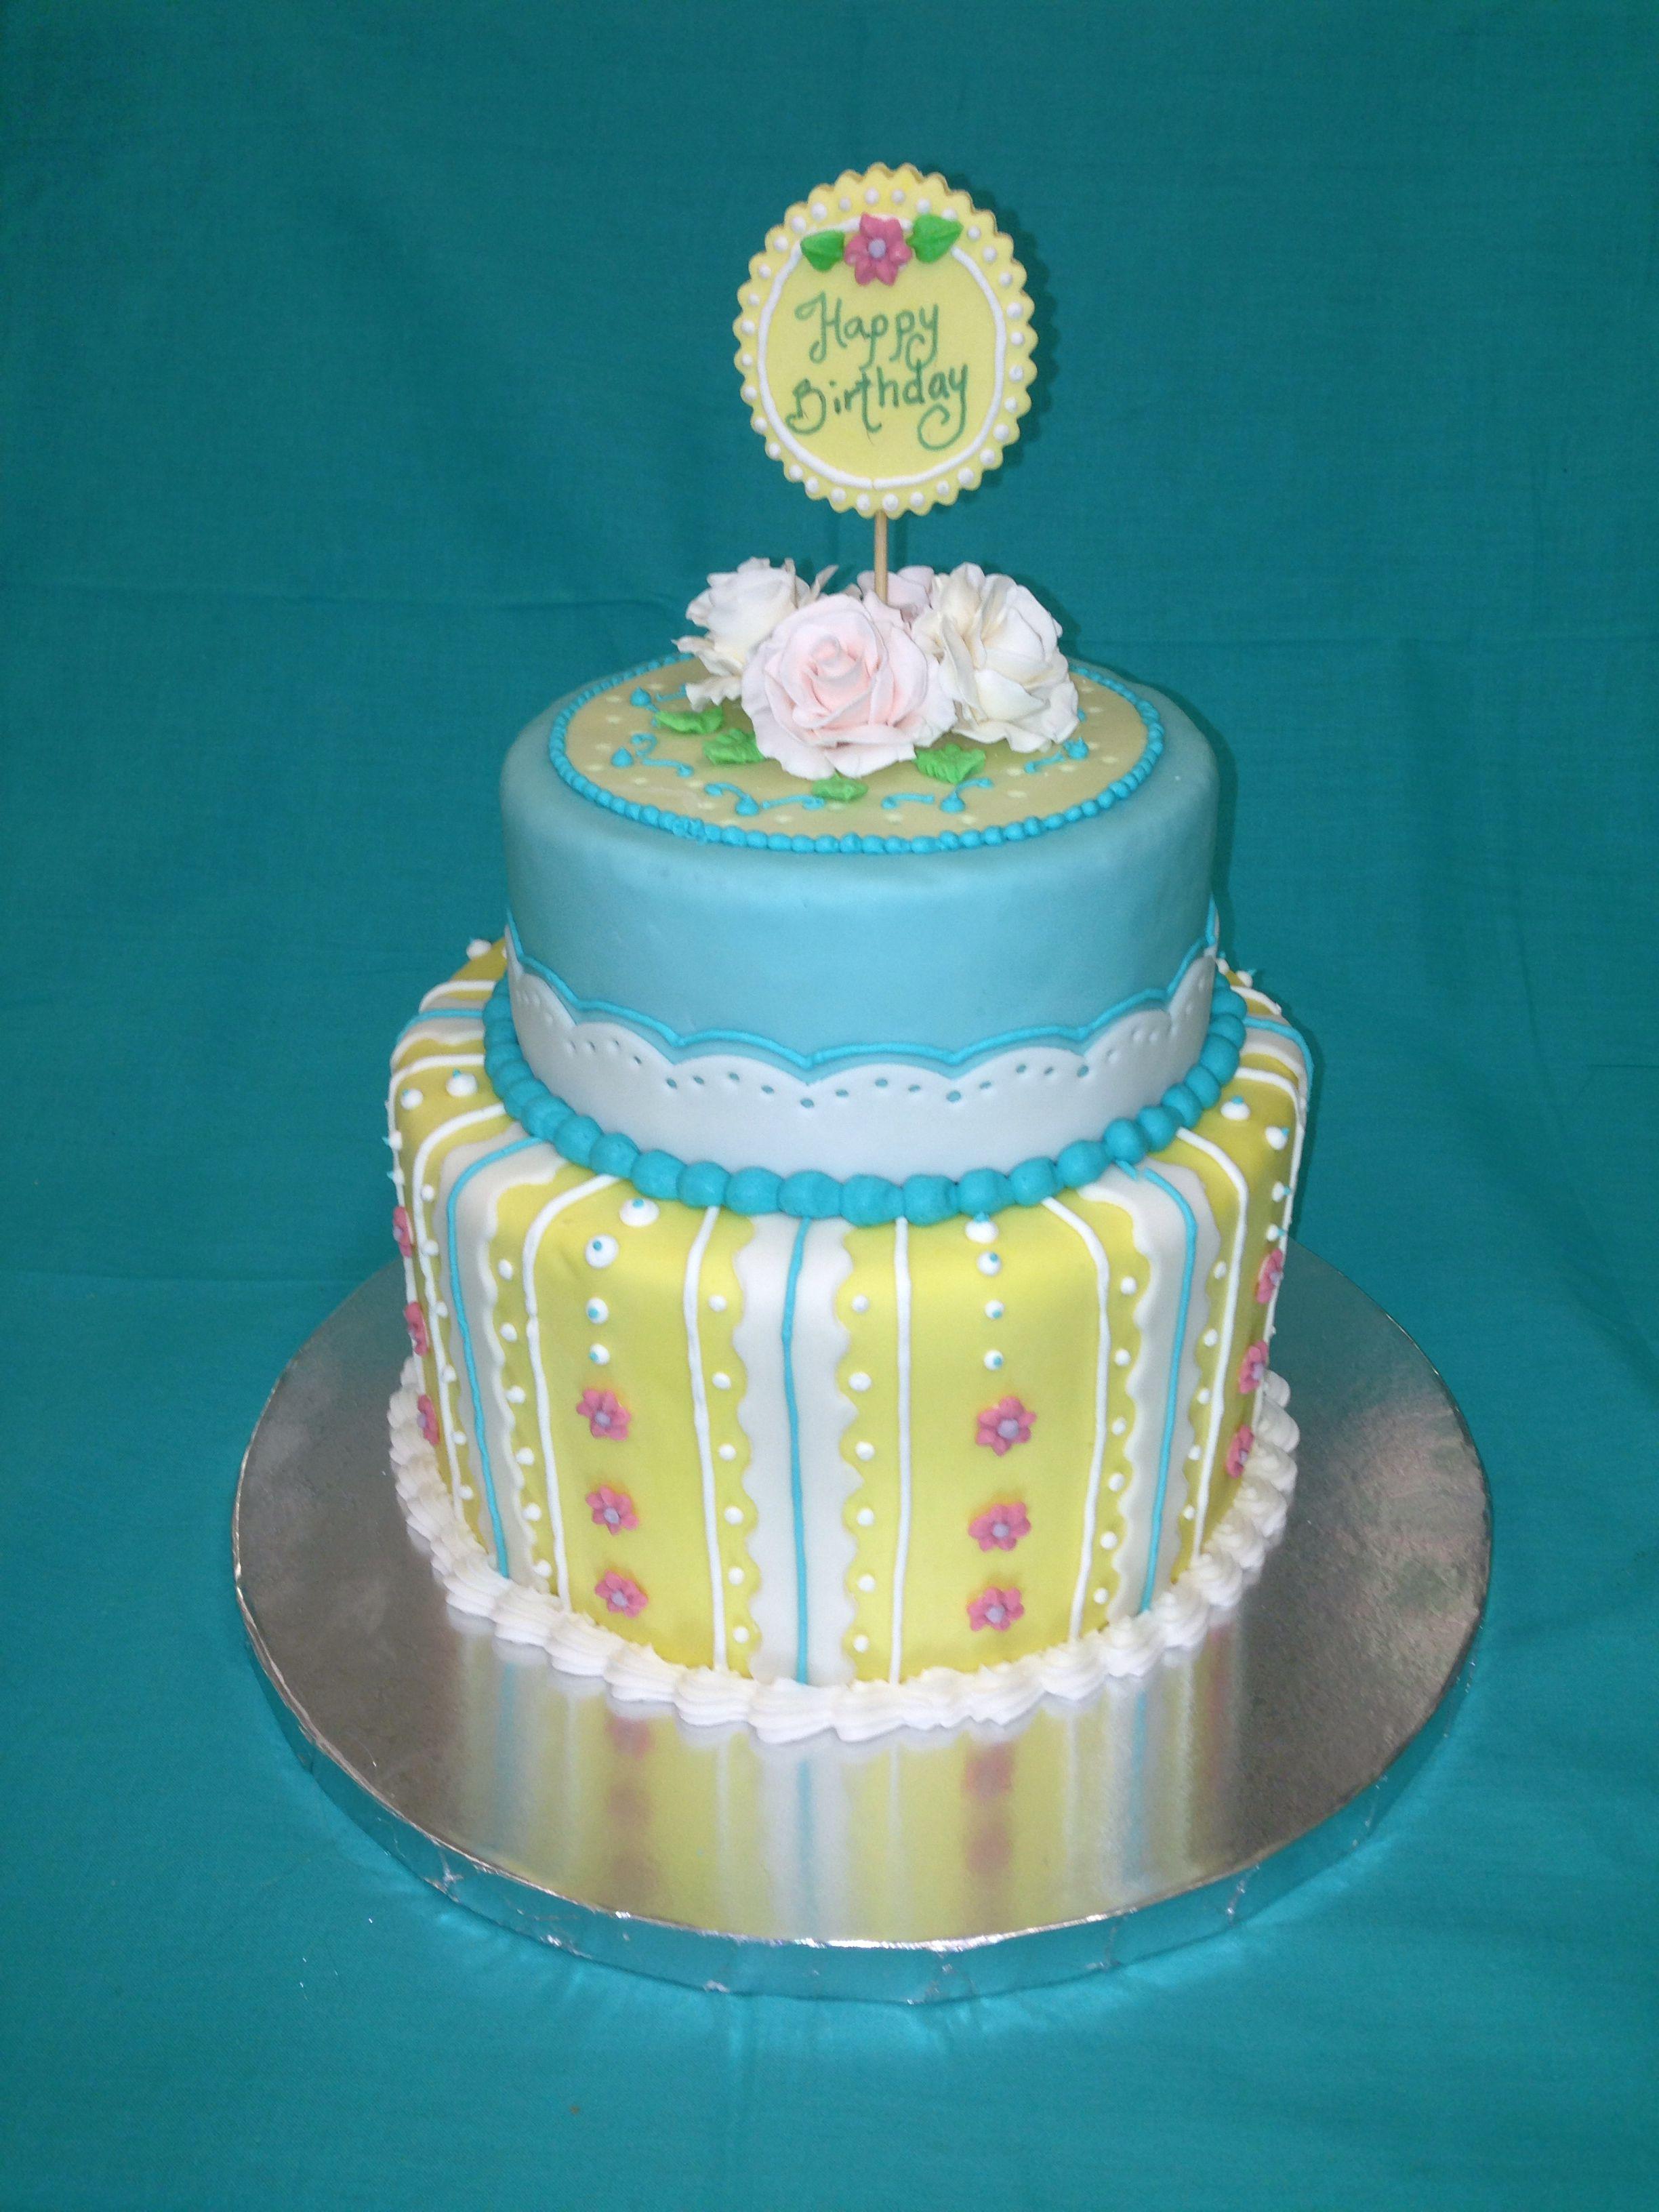 Birthday cake, fondant and frosting